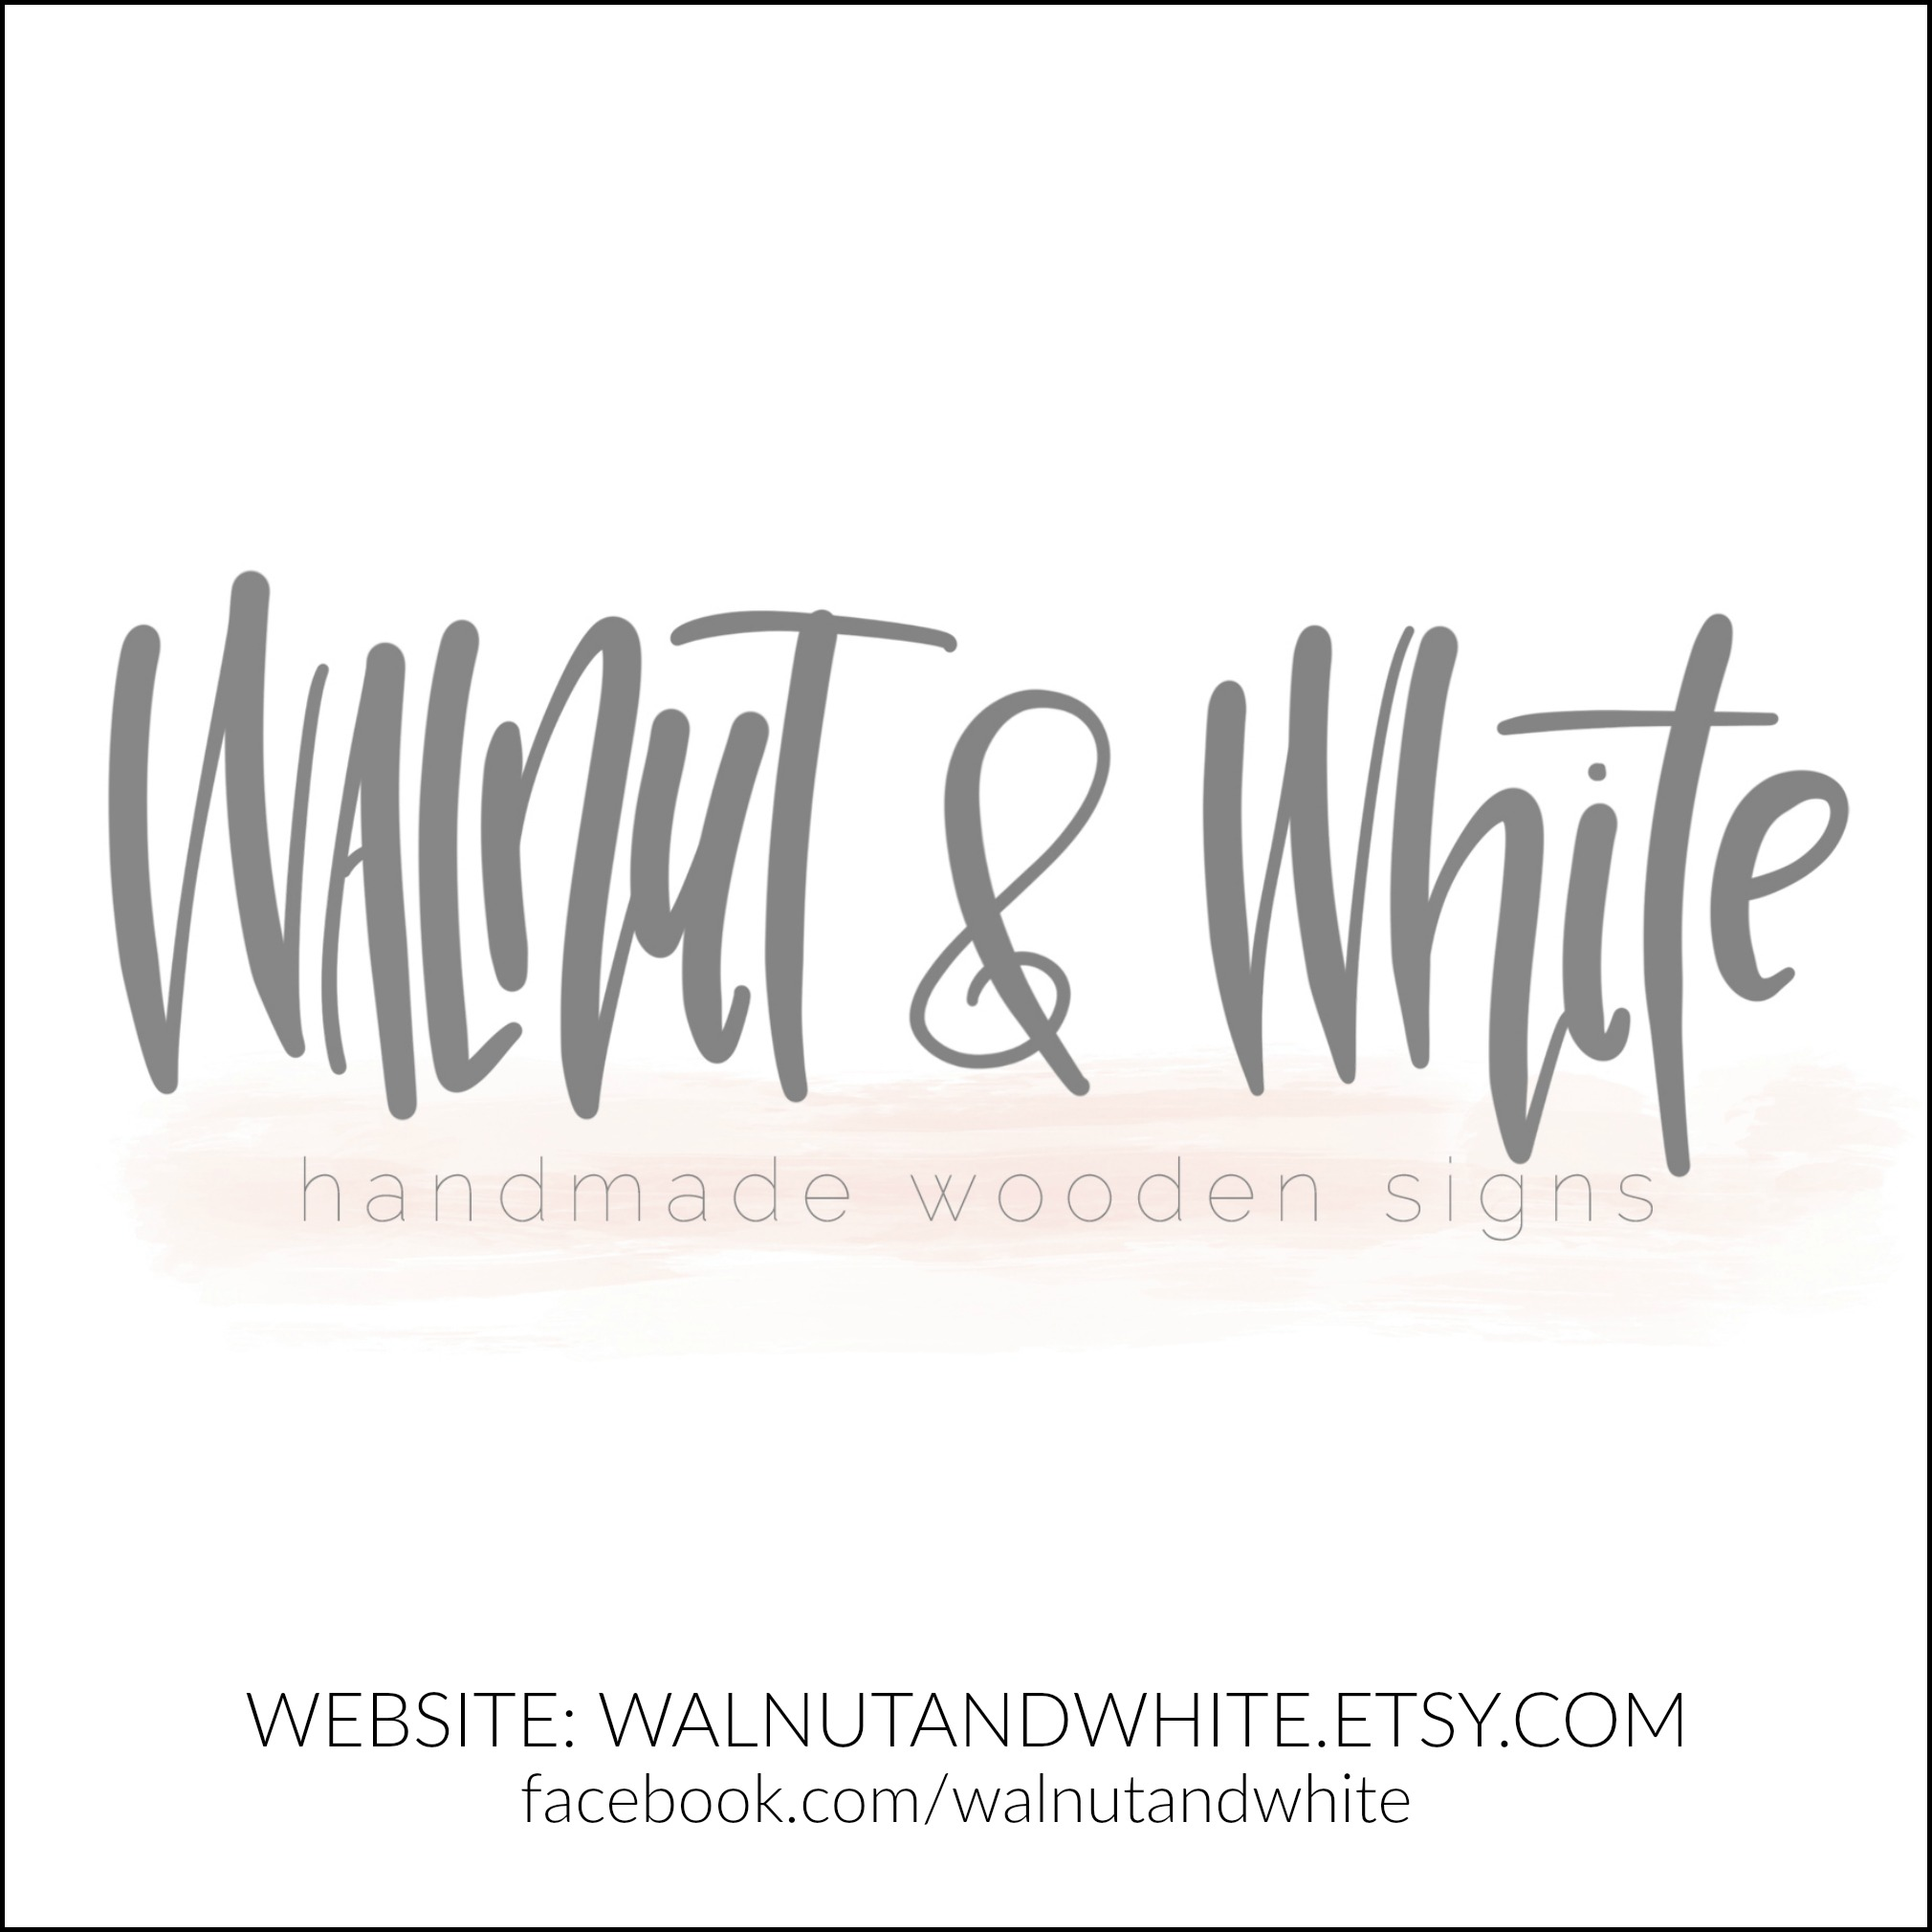 Walnut & White Handmade Wooden Signs | Walnutandwhite.etsy.com